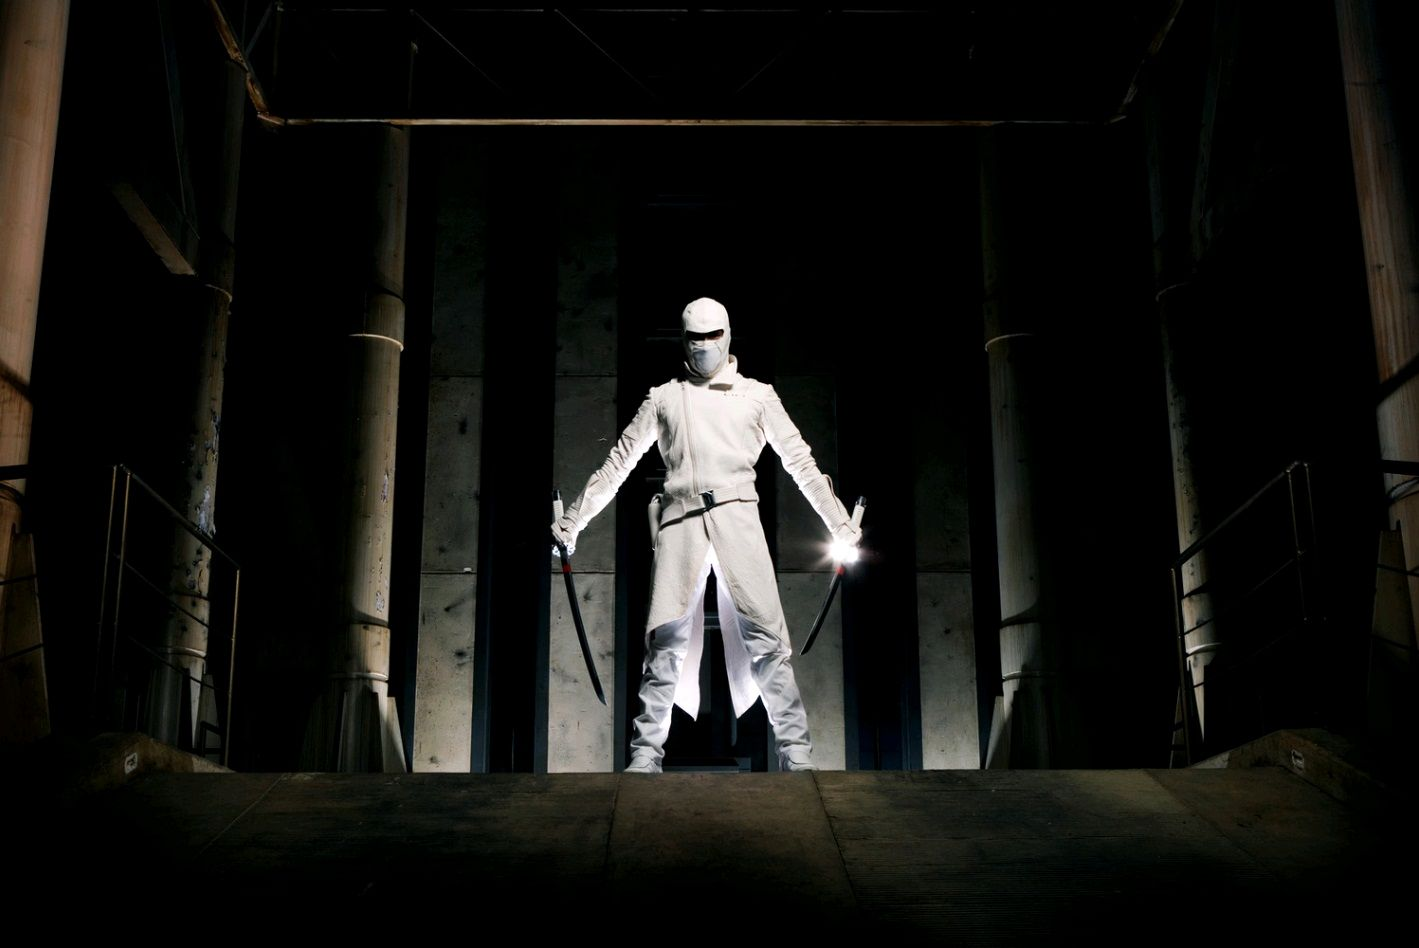 Бросок кобры / G.I. Joe: The Rise of Cobra (2009): кадр из фильма